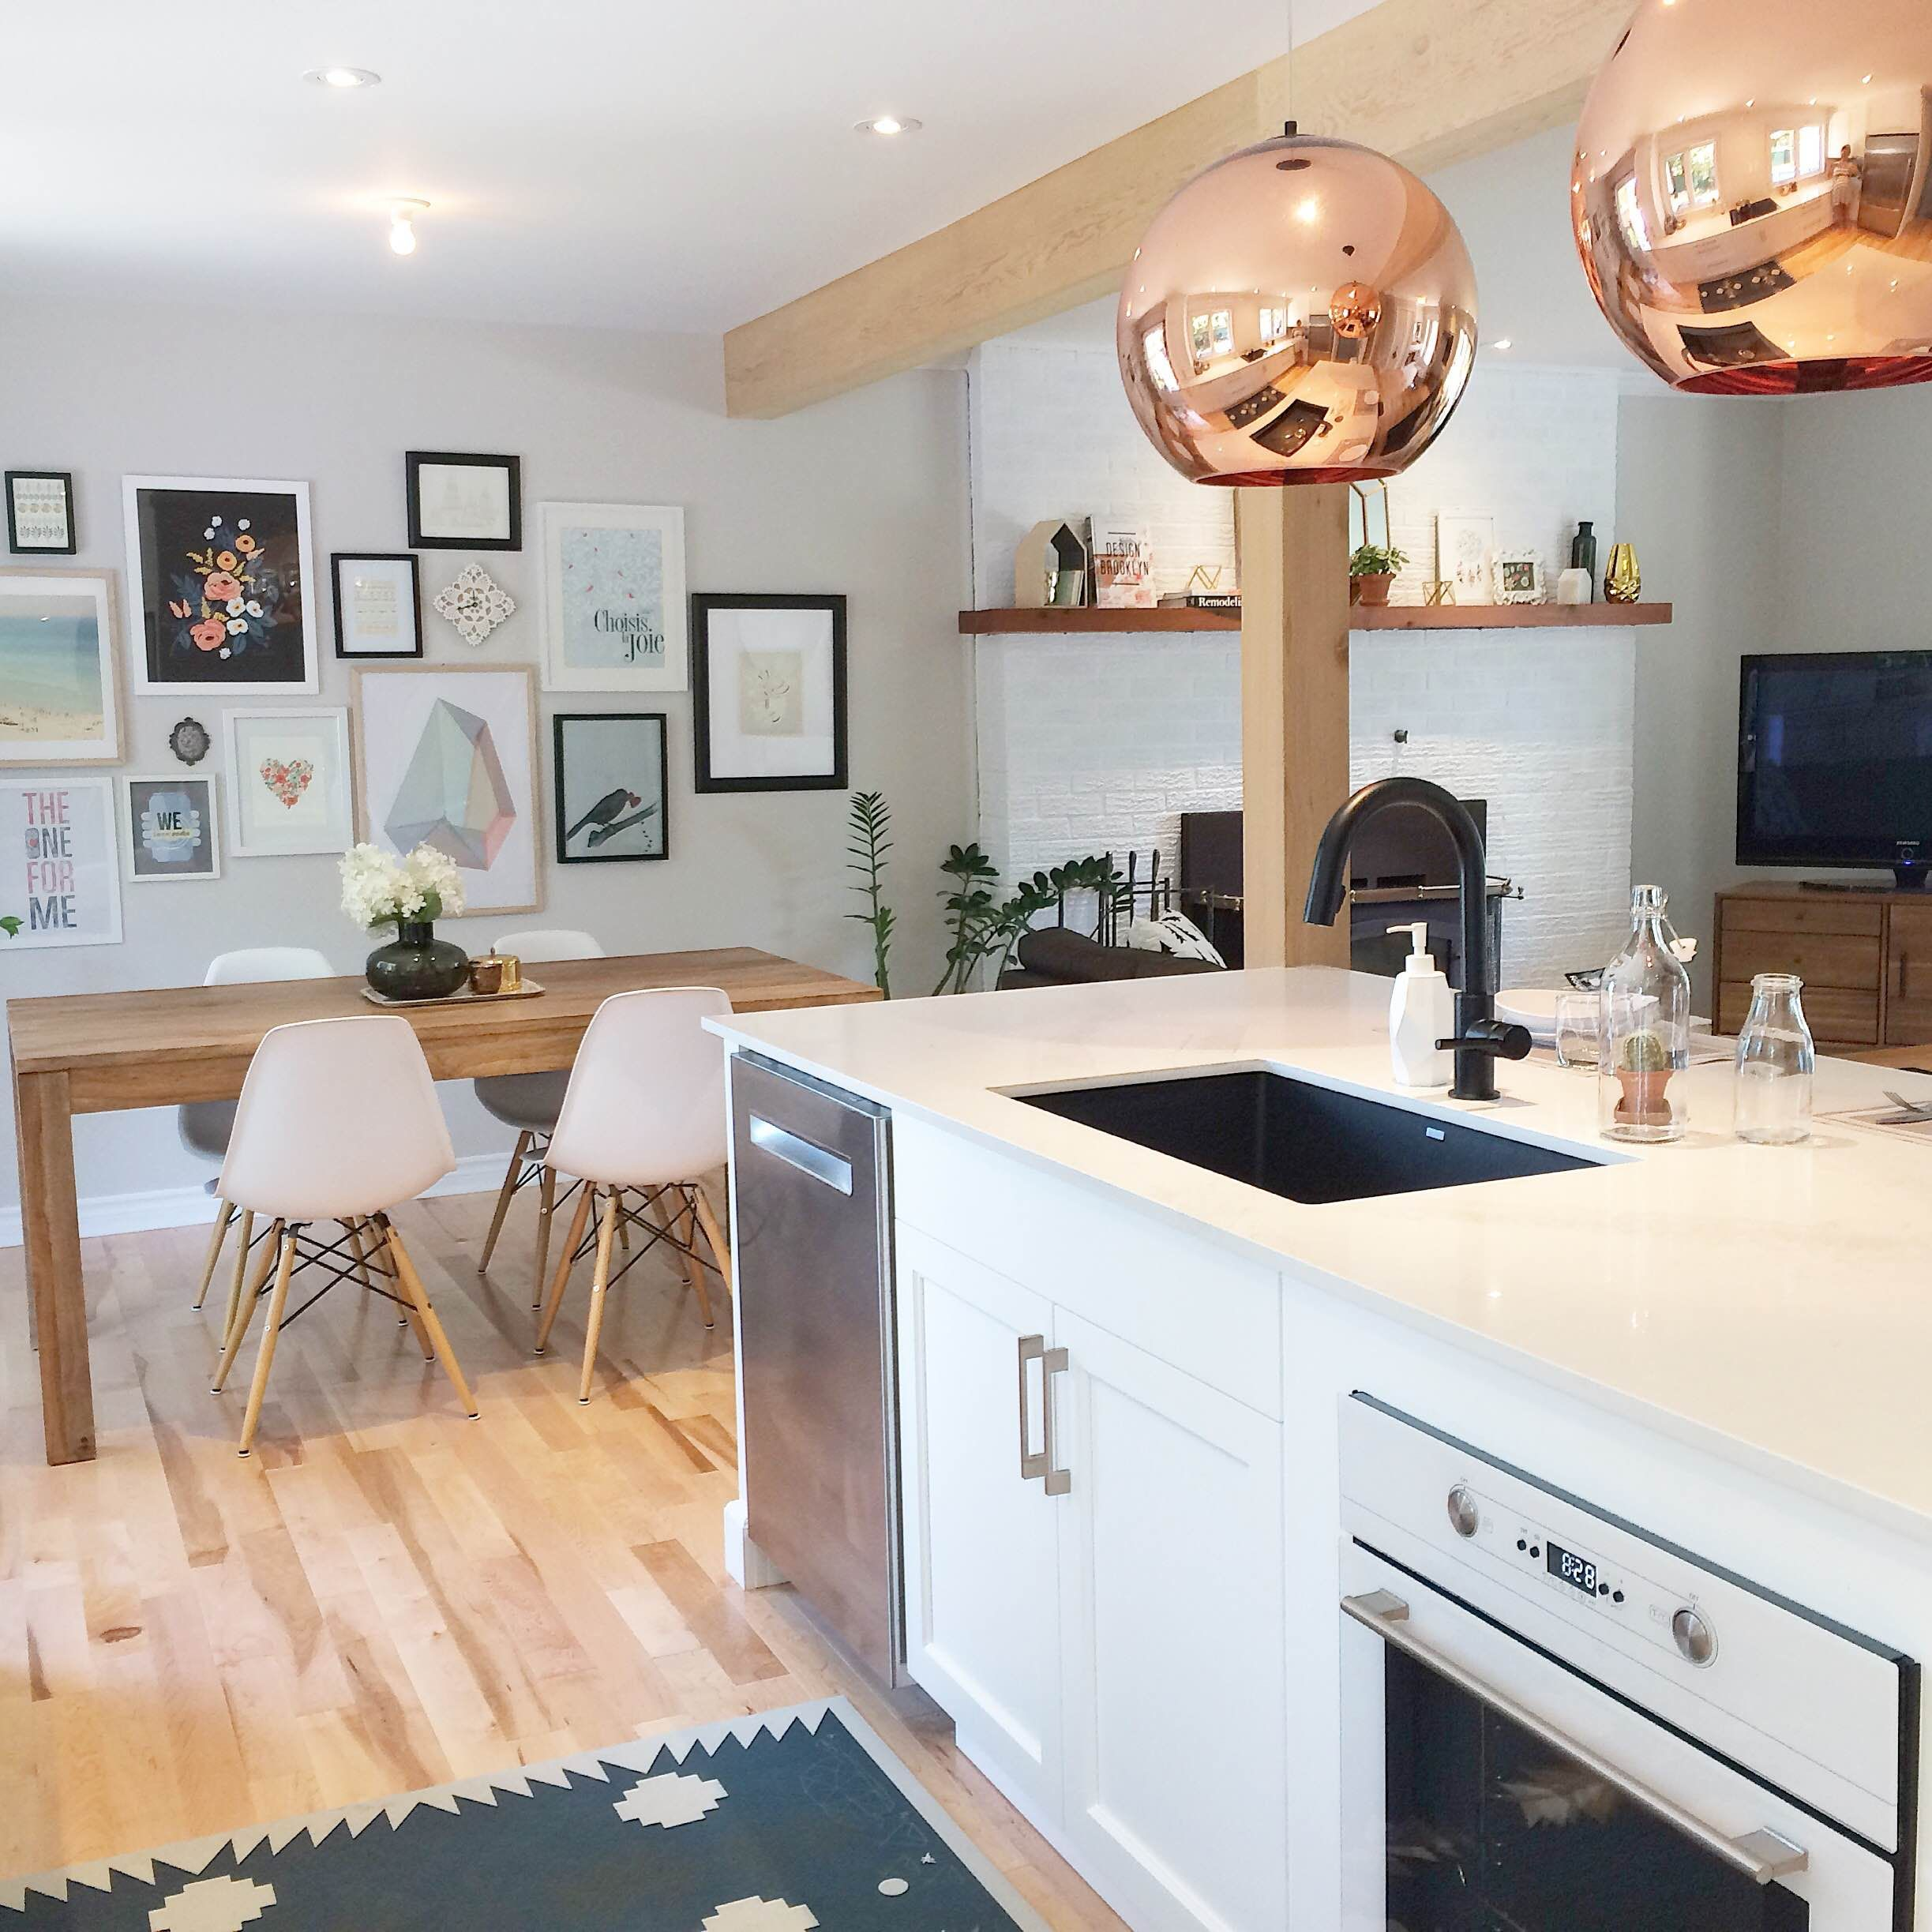 Cute kitchen belle cuisine buk nola interiordesign Belle cuisine moderne